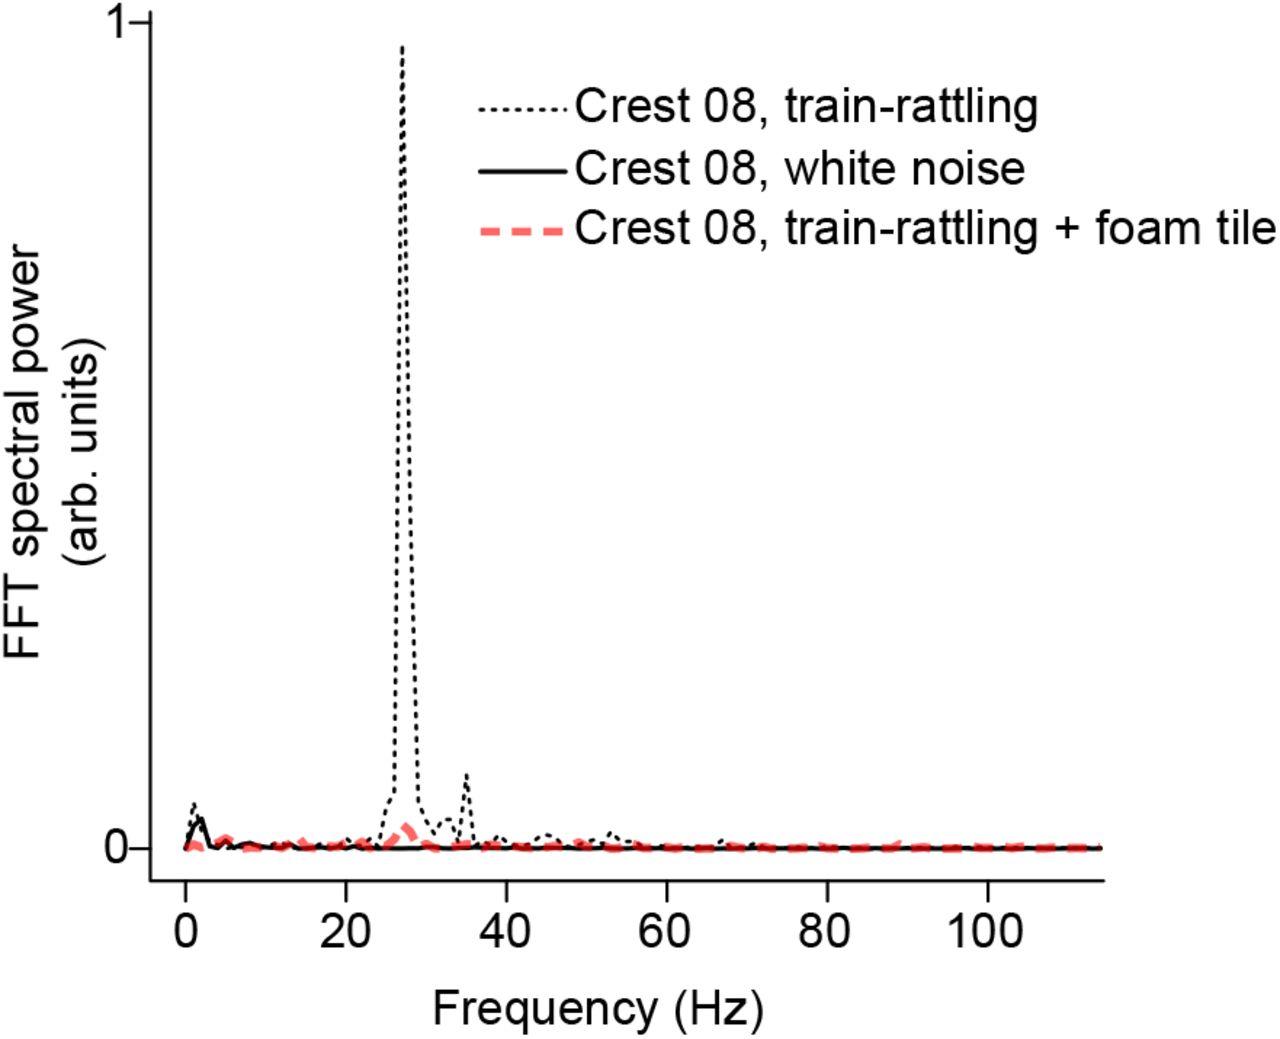 Biomechanics of the peafowl's crest reveals frequencies